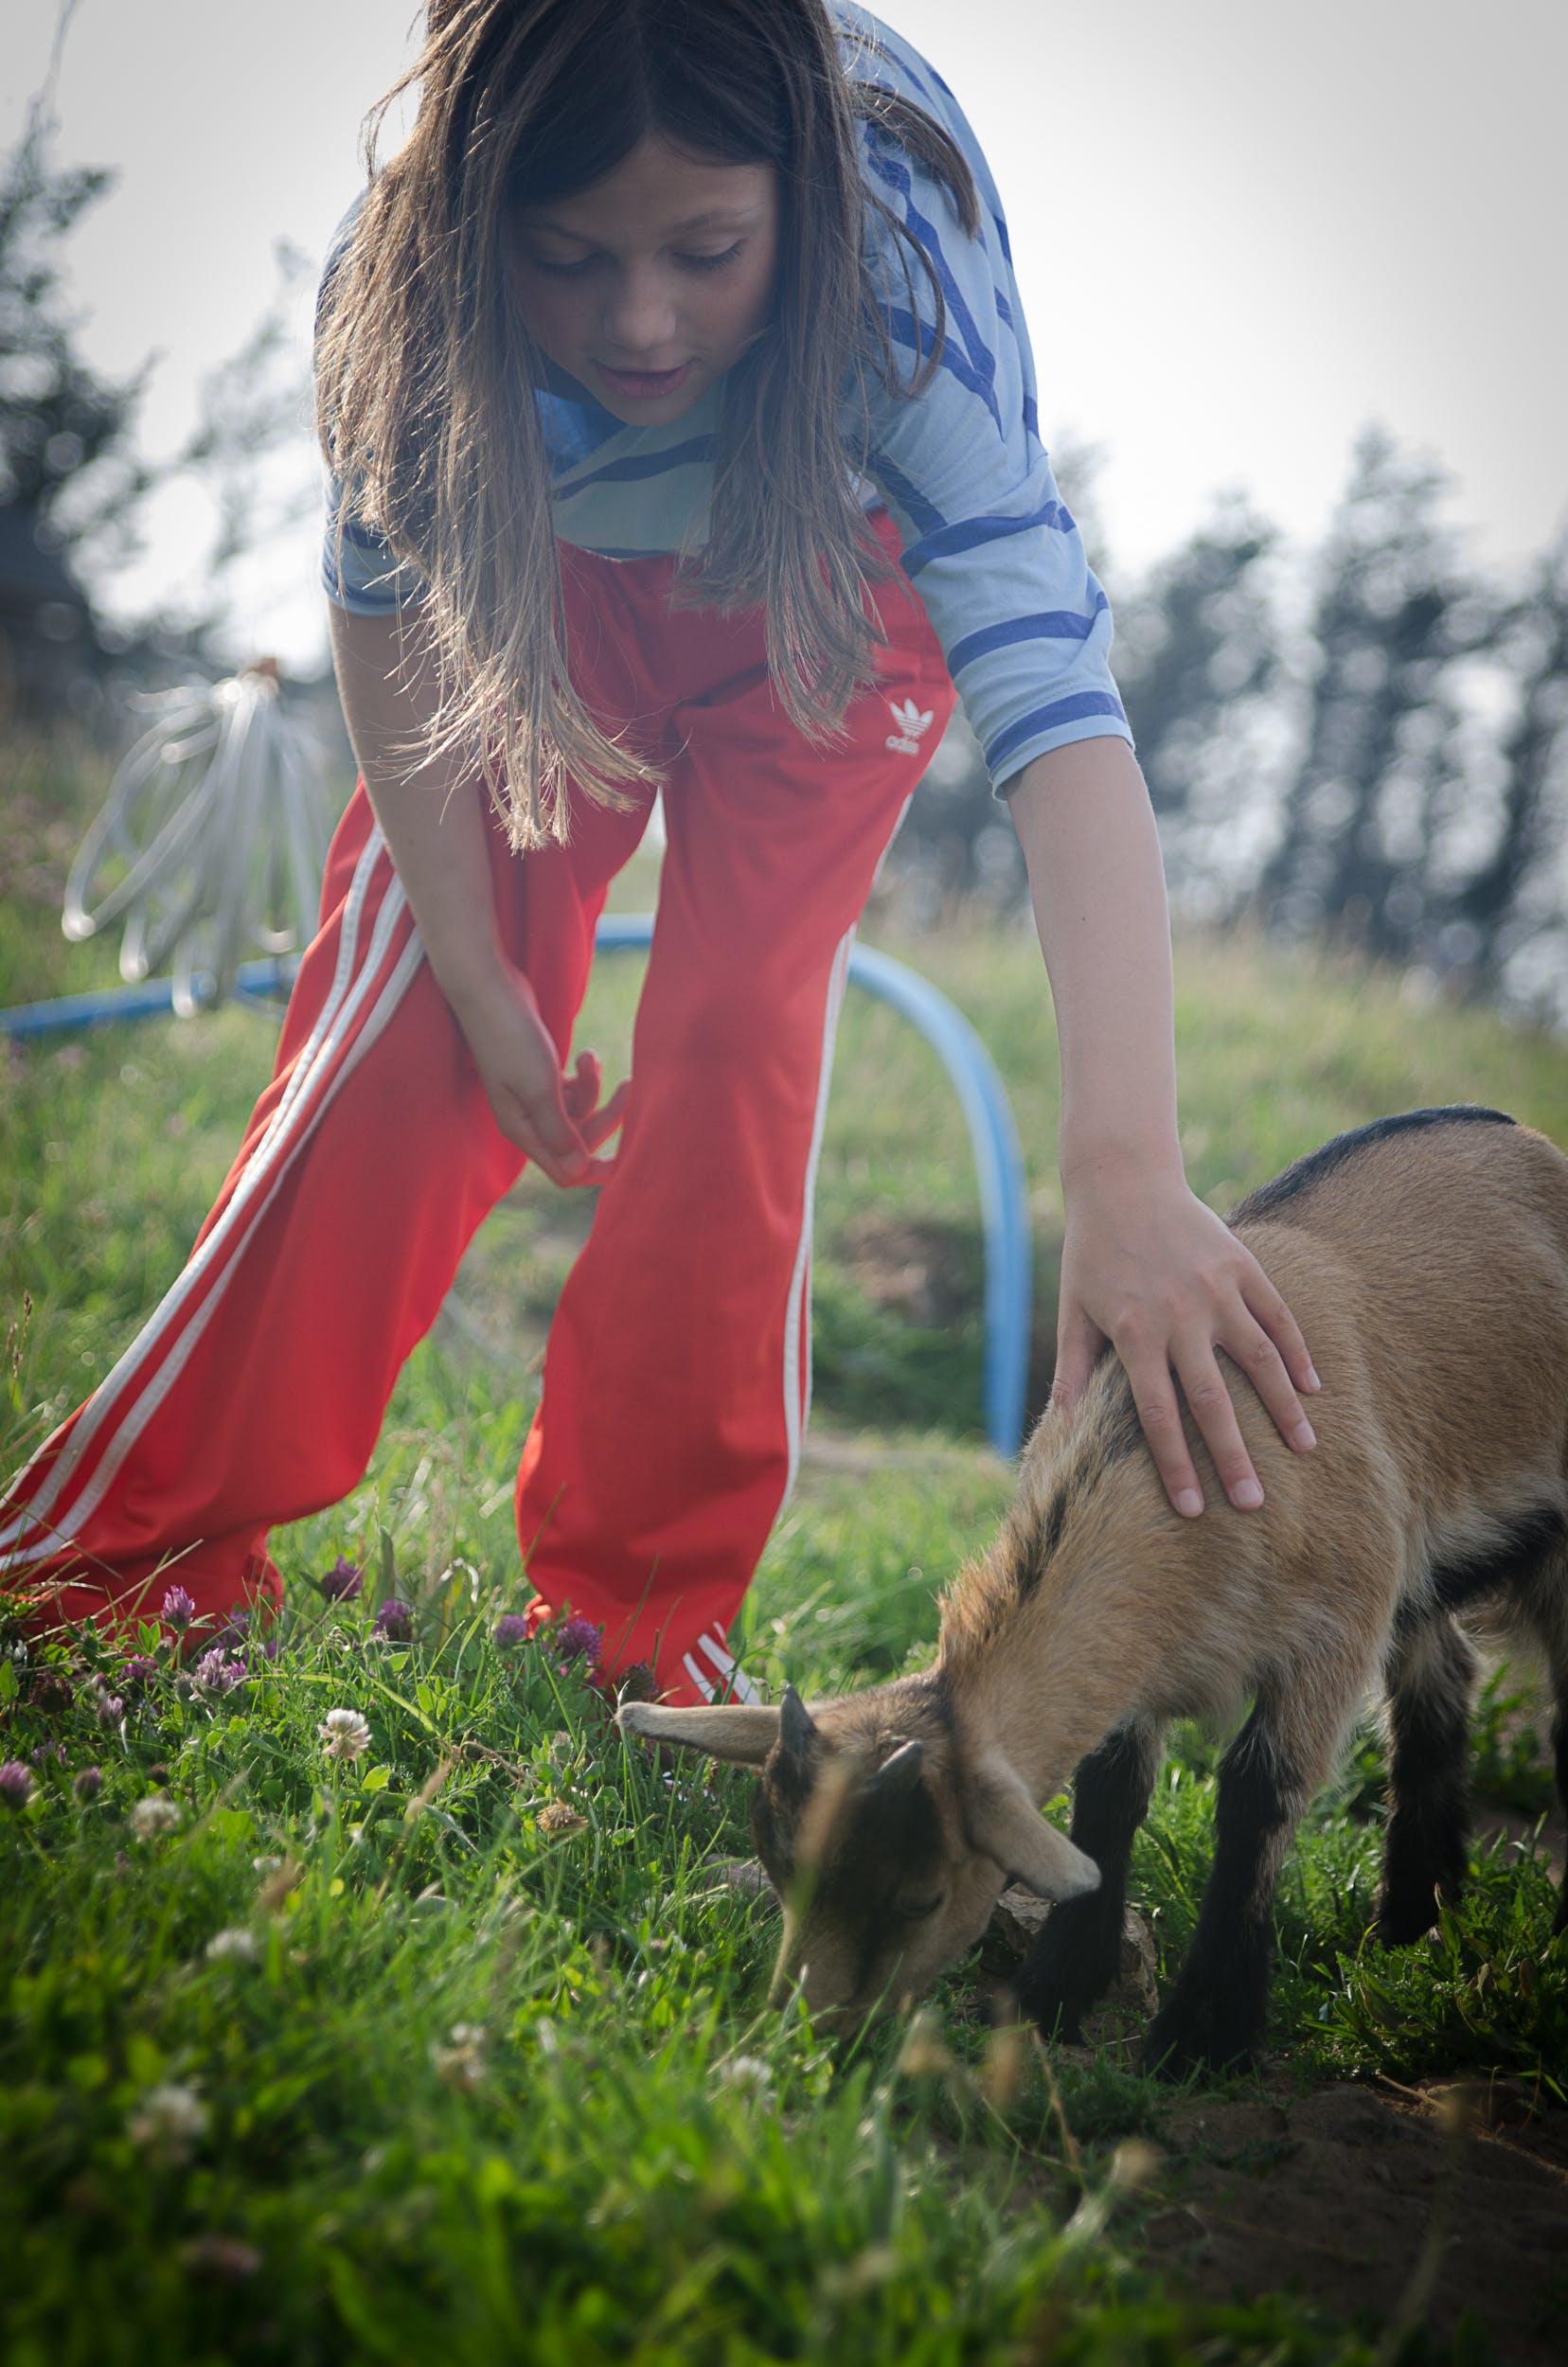 Free stock photo of child, girl, goat, summer